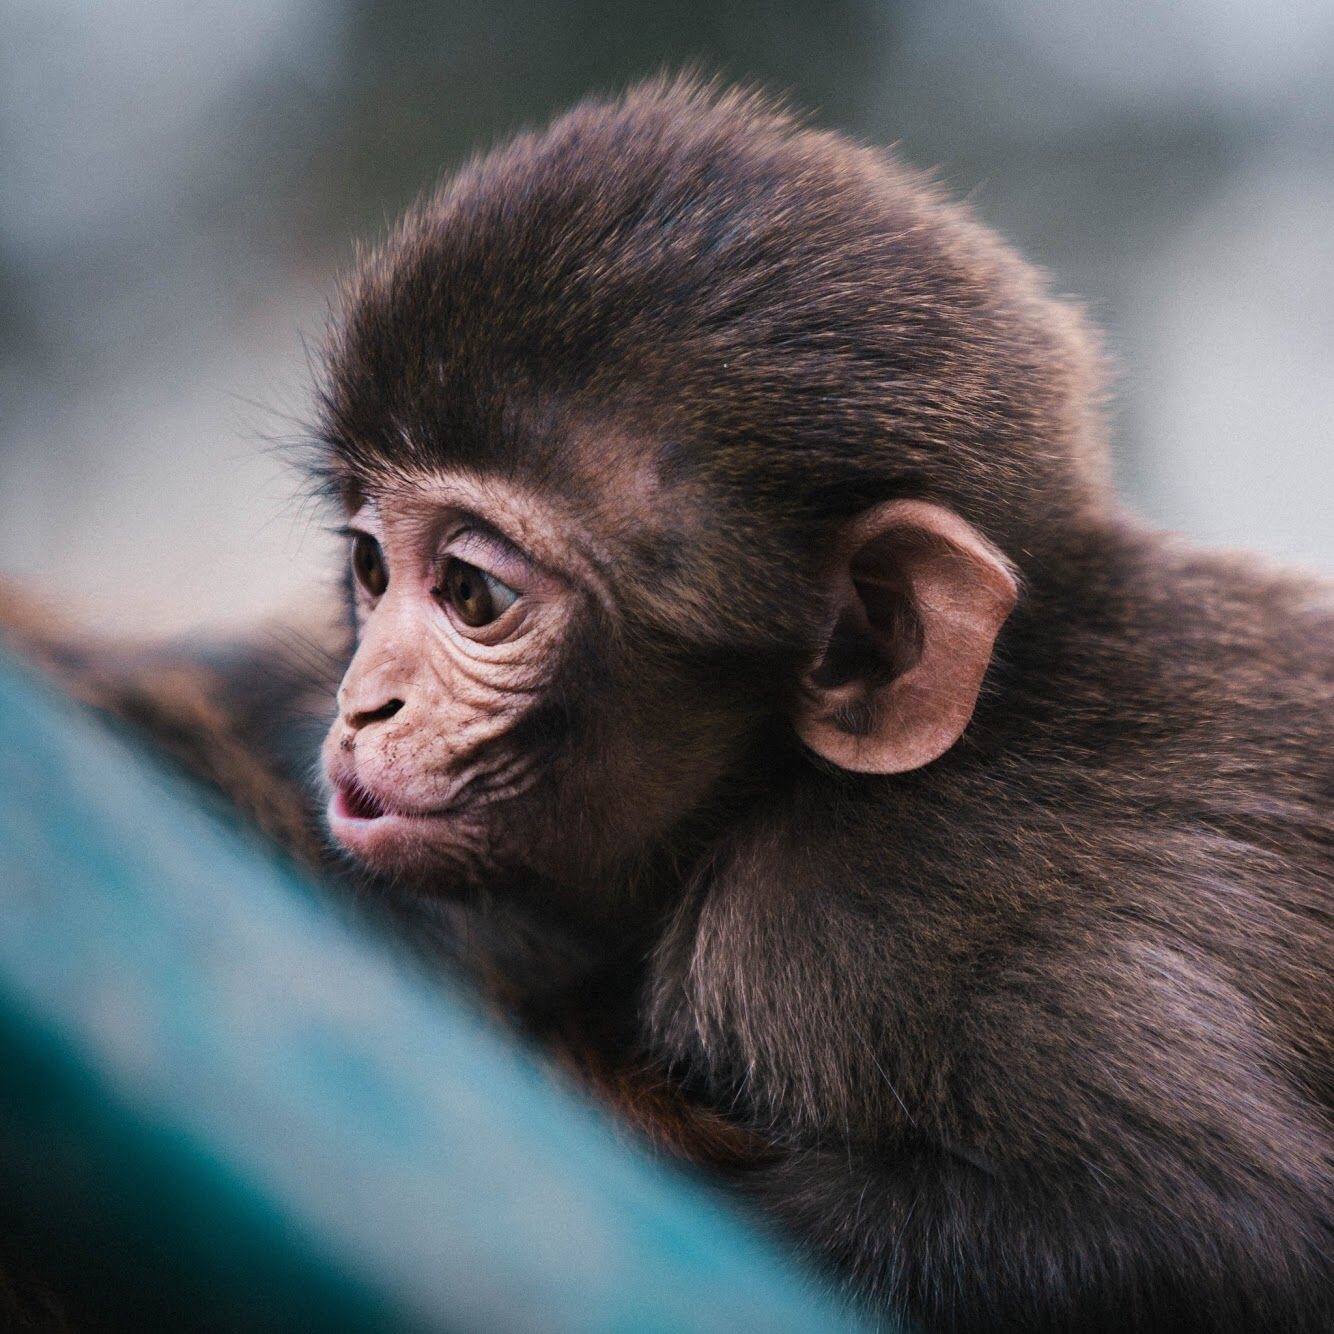 Lol Cute Monkey